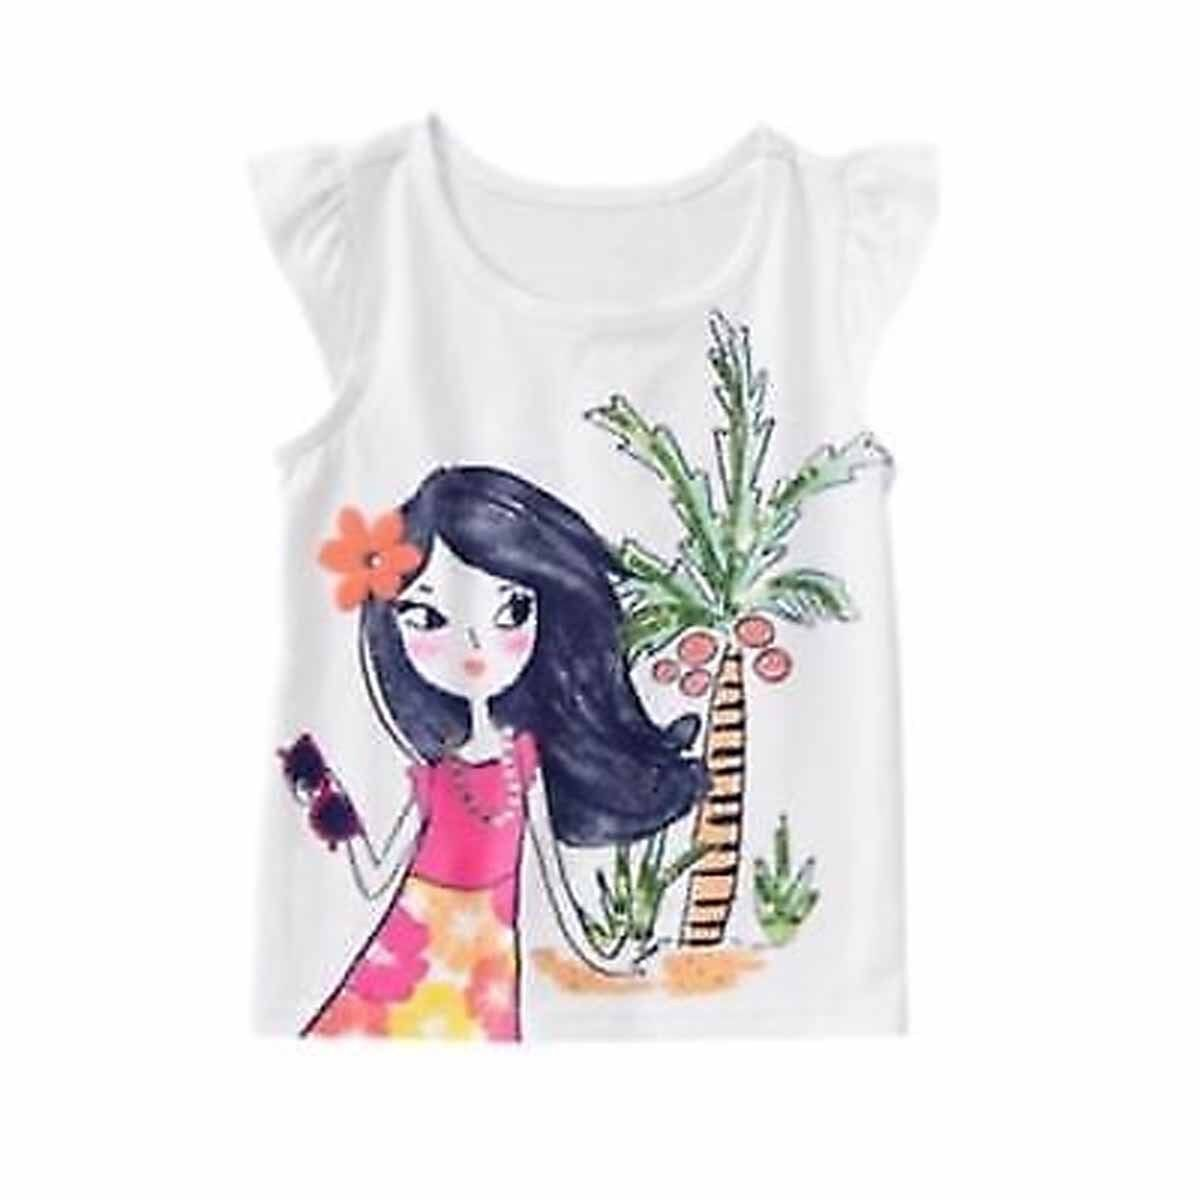 NWT Gymboree Spring Summer Top Tee Shirt Girls New